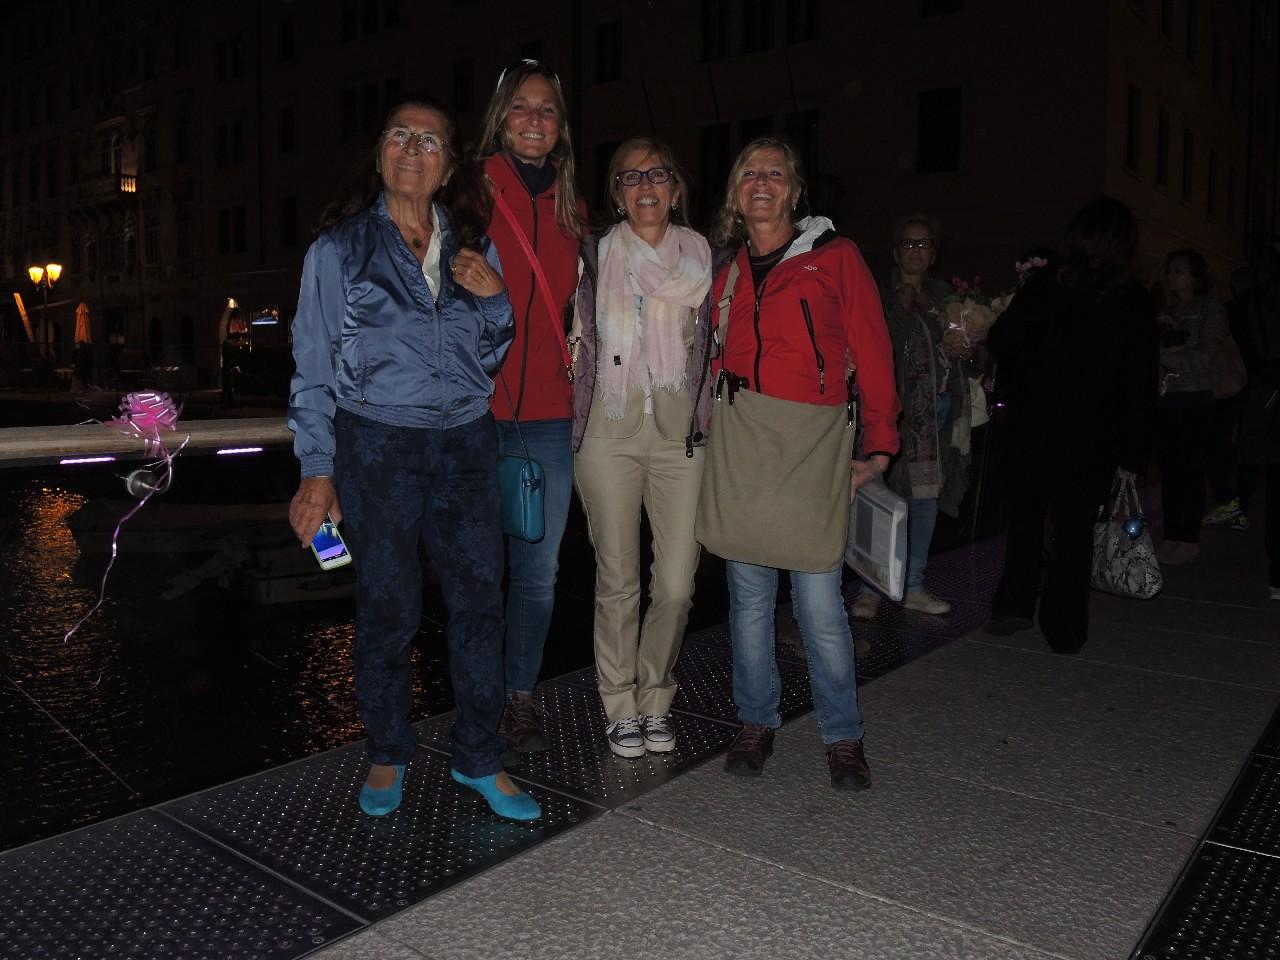 2015-10-02 Nordic Walking - LILT - Nastro Rosa (11)